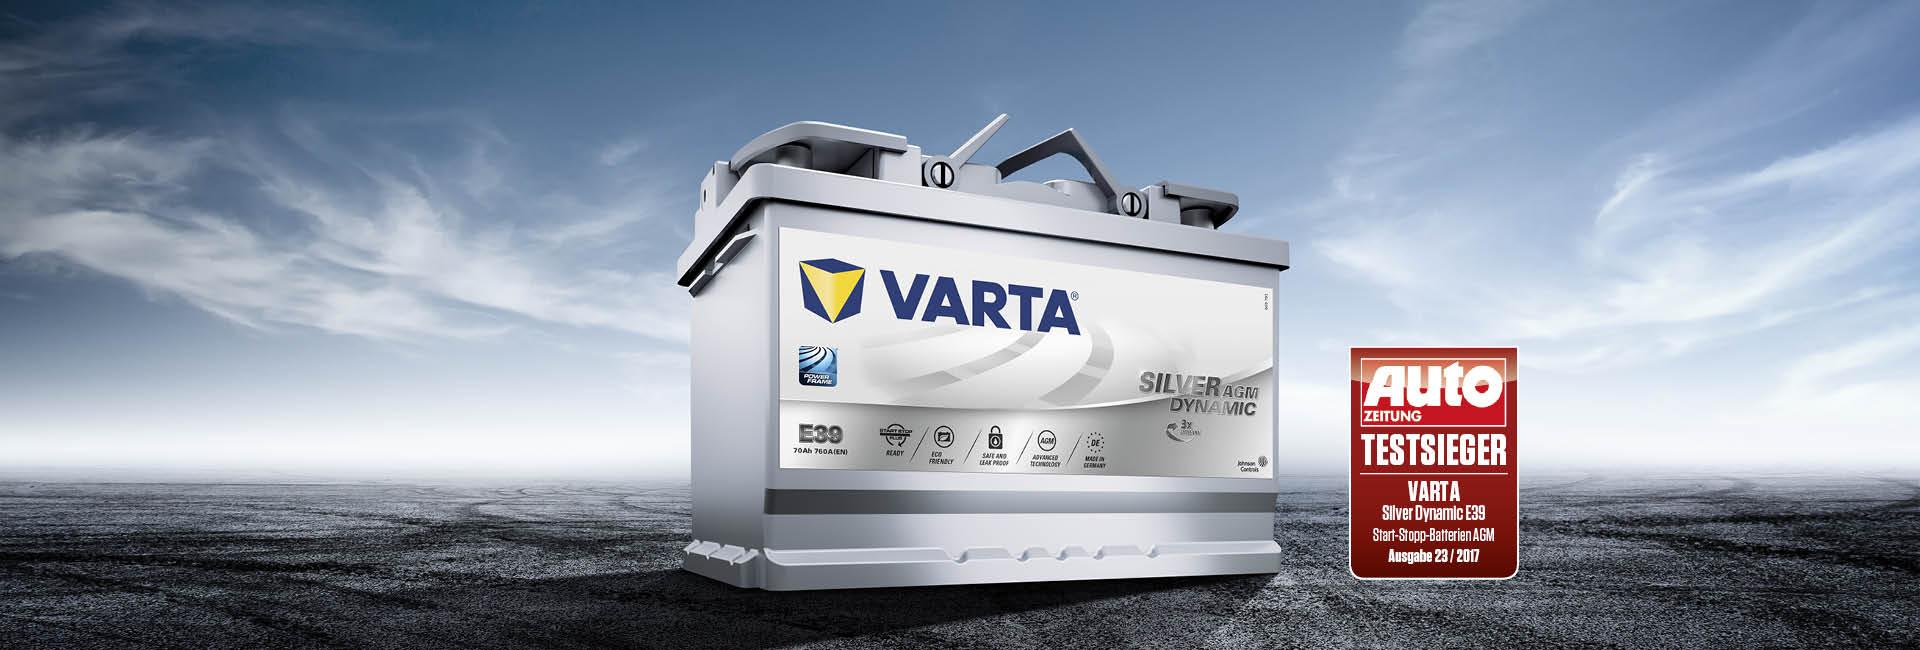 Varta Car Batteries Malaysia